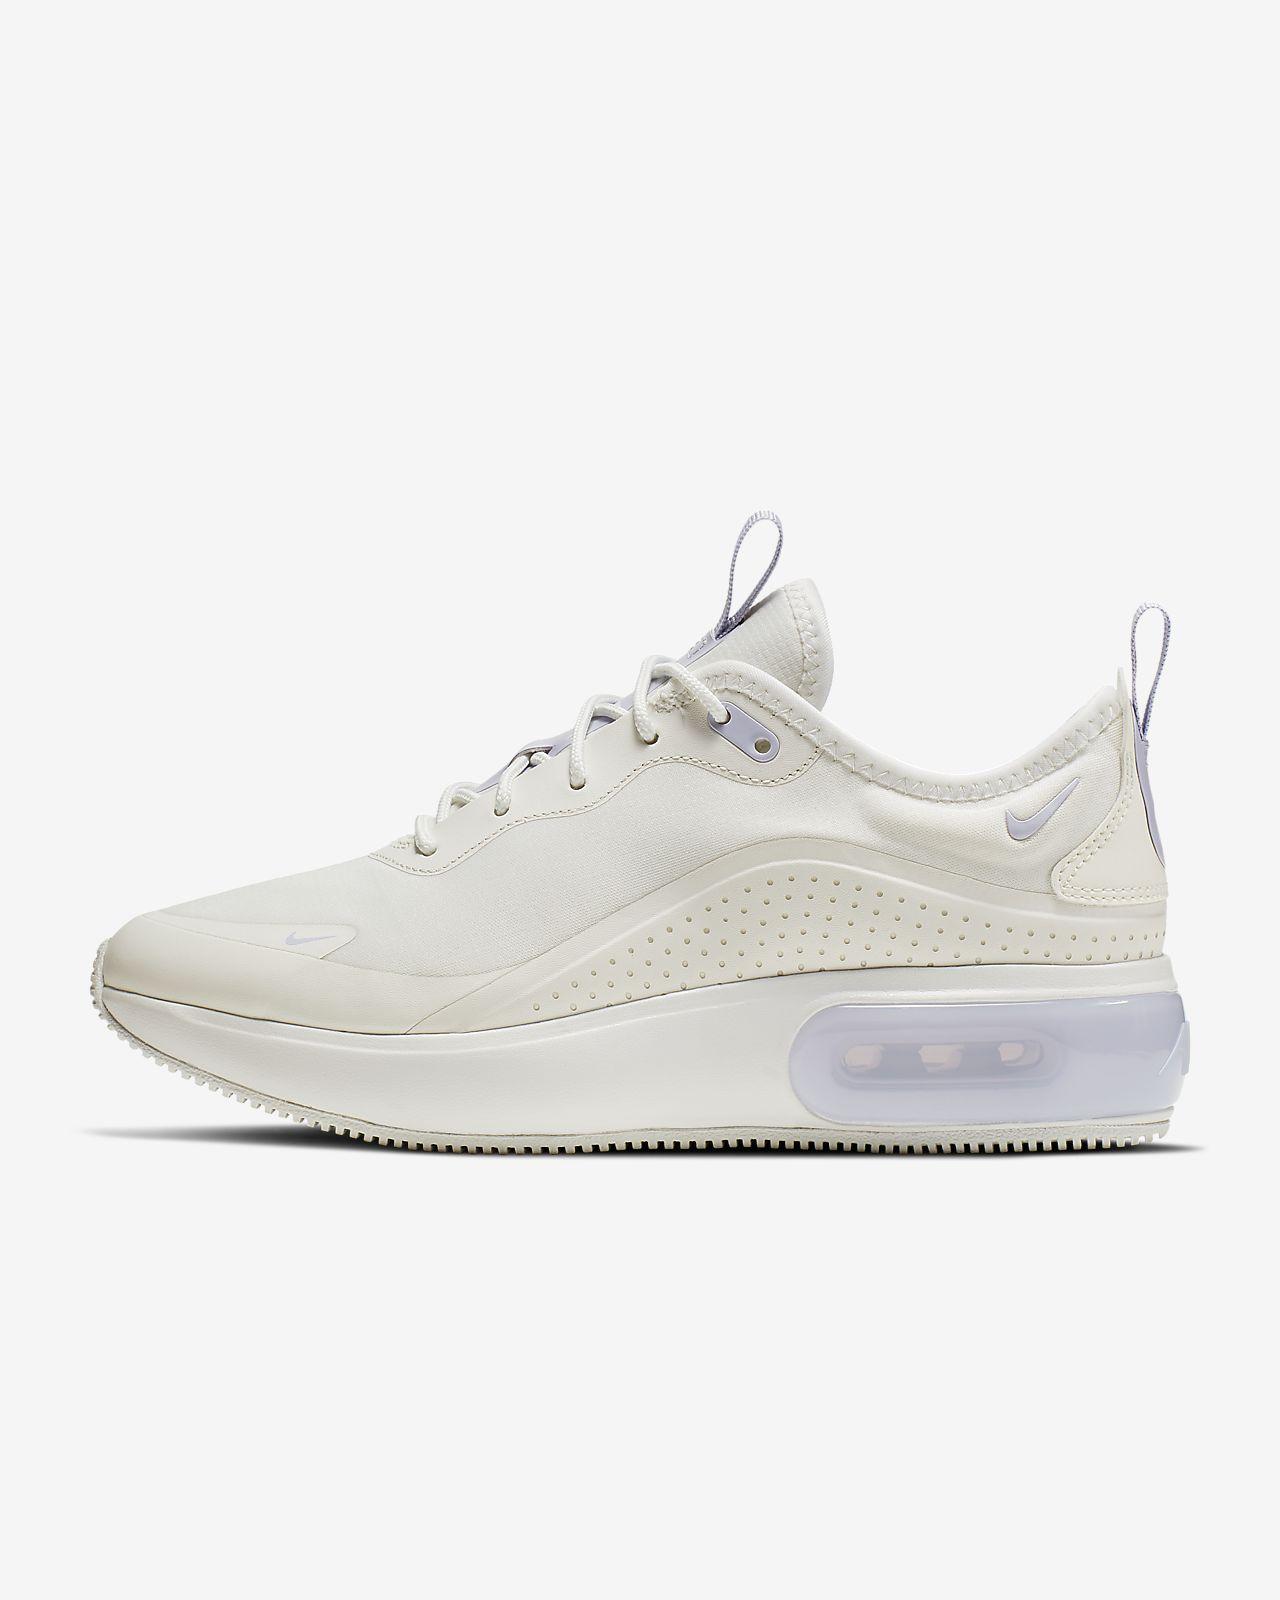 online retailer a1844 1209e Nike Air Max Dia